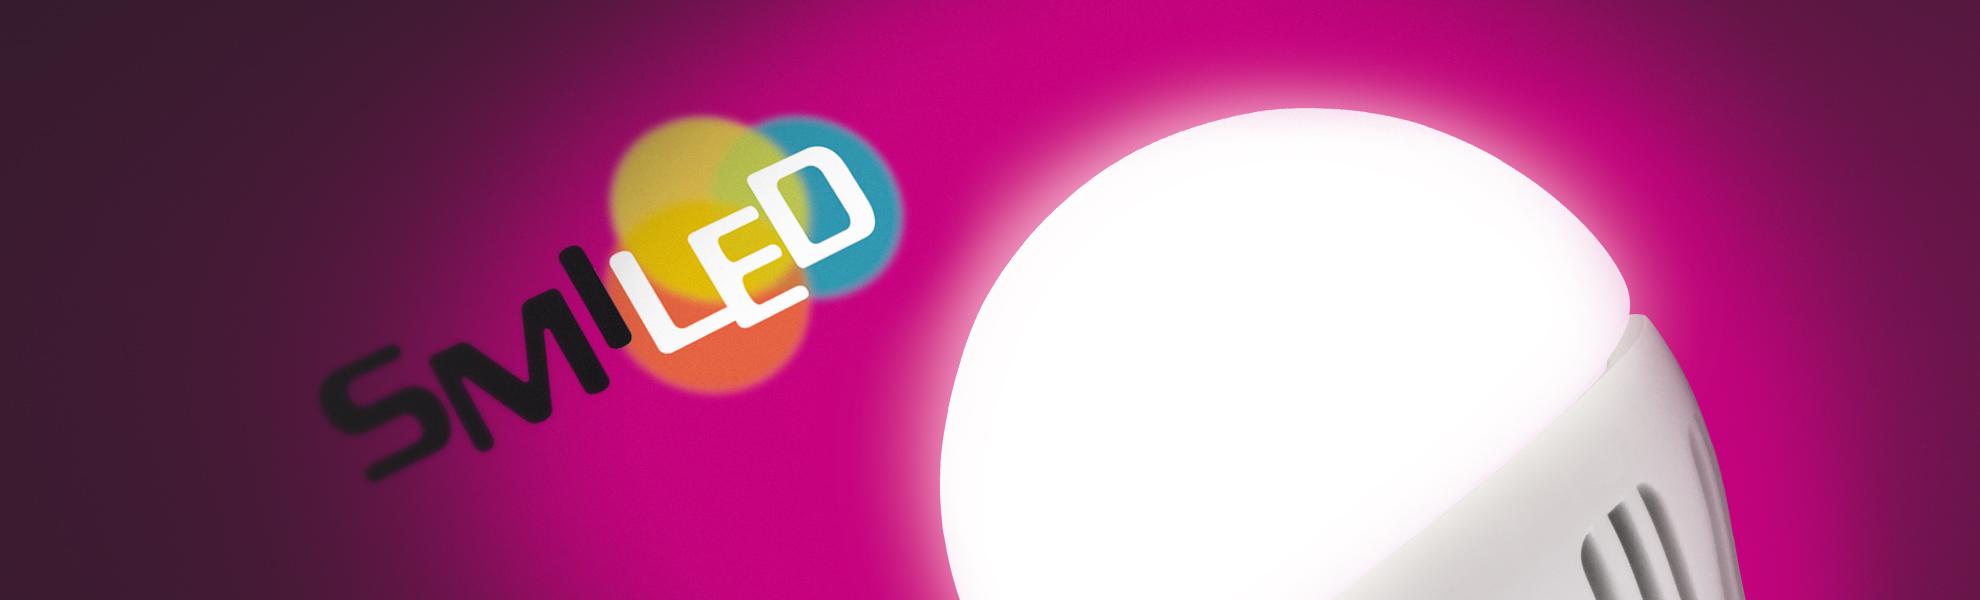 chelles-e-hayashi-design-portfolio-smiled-packaging-identity-graphic-branding